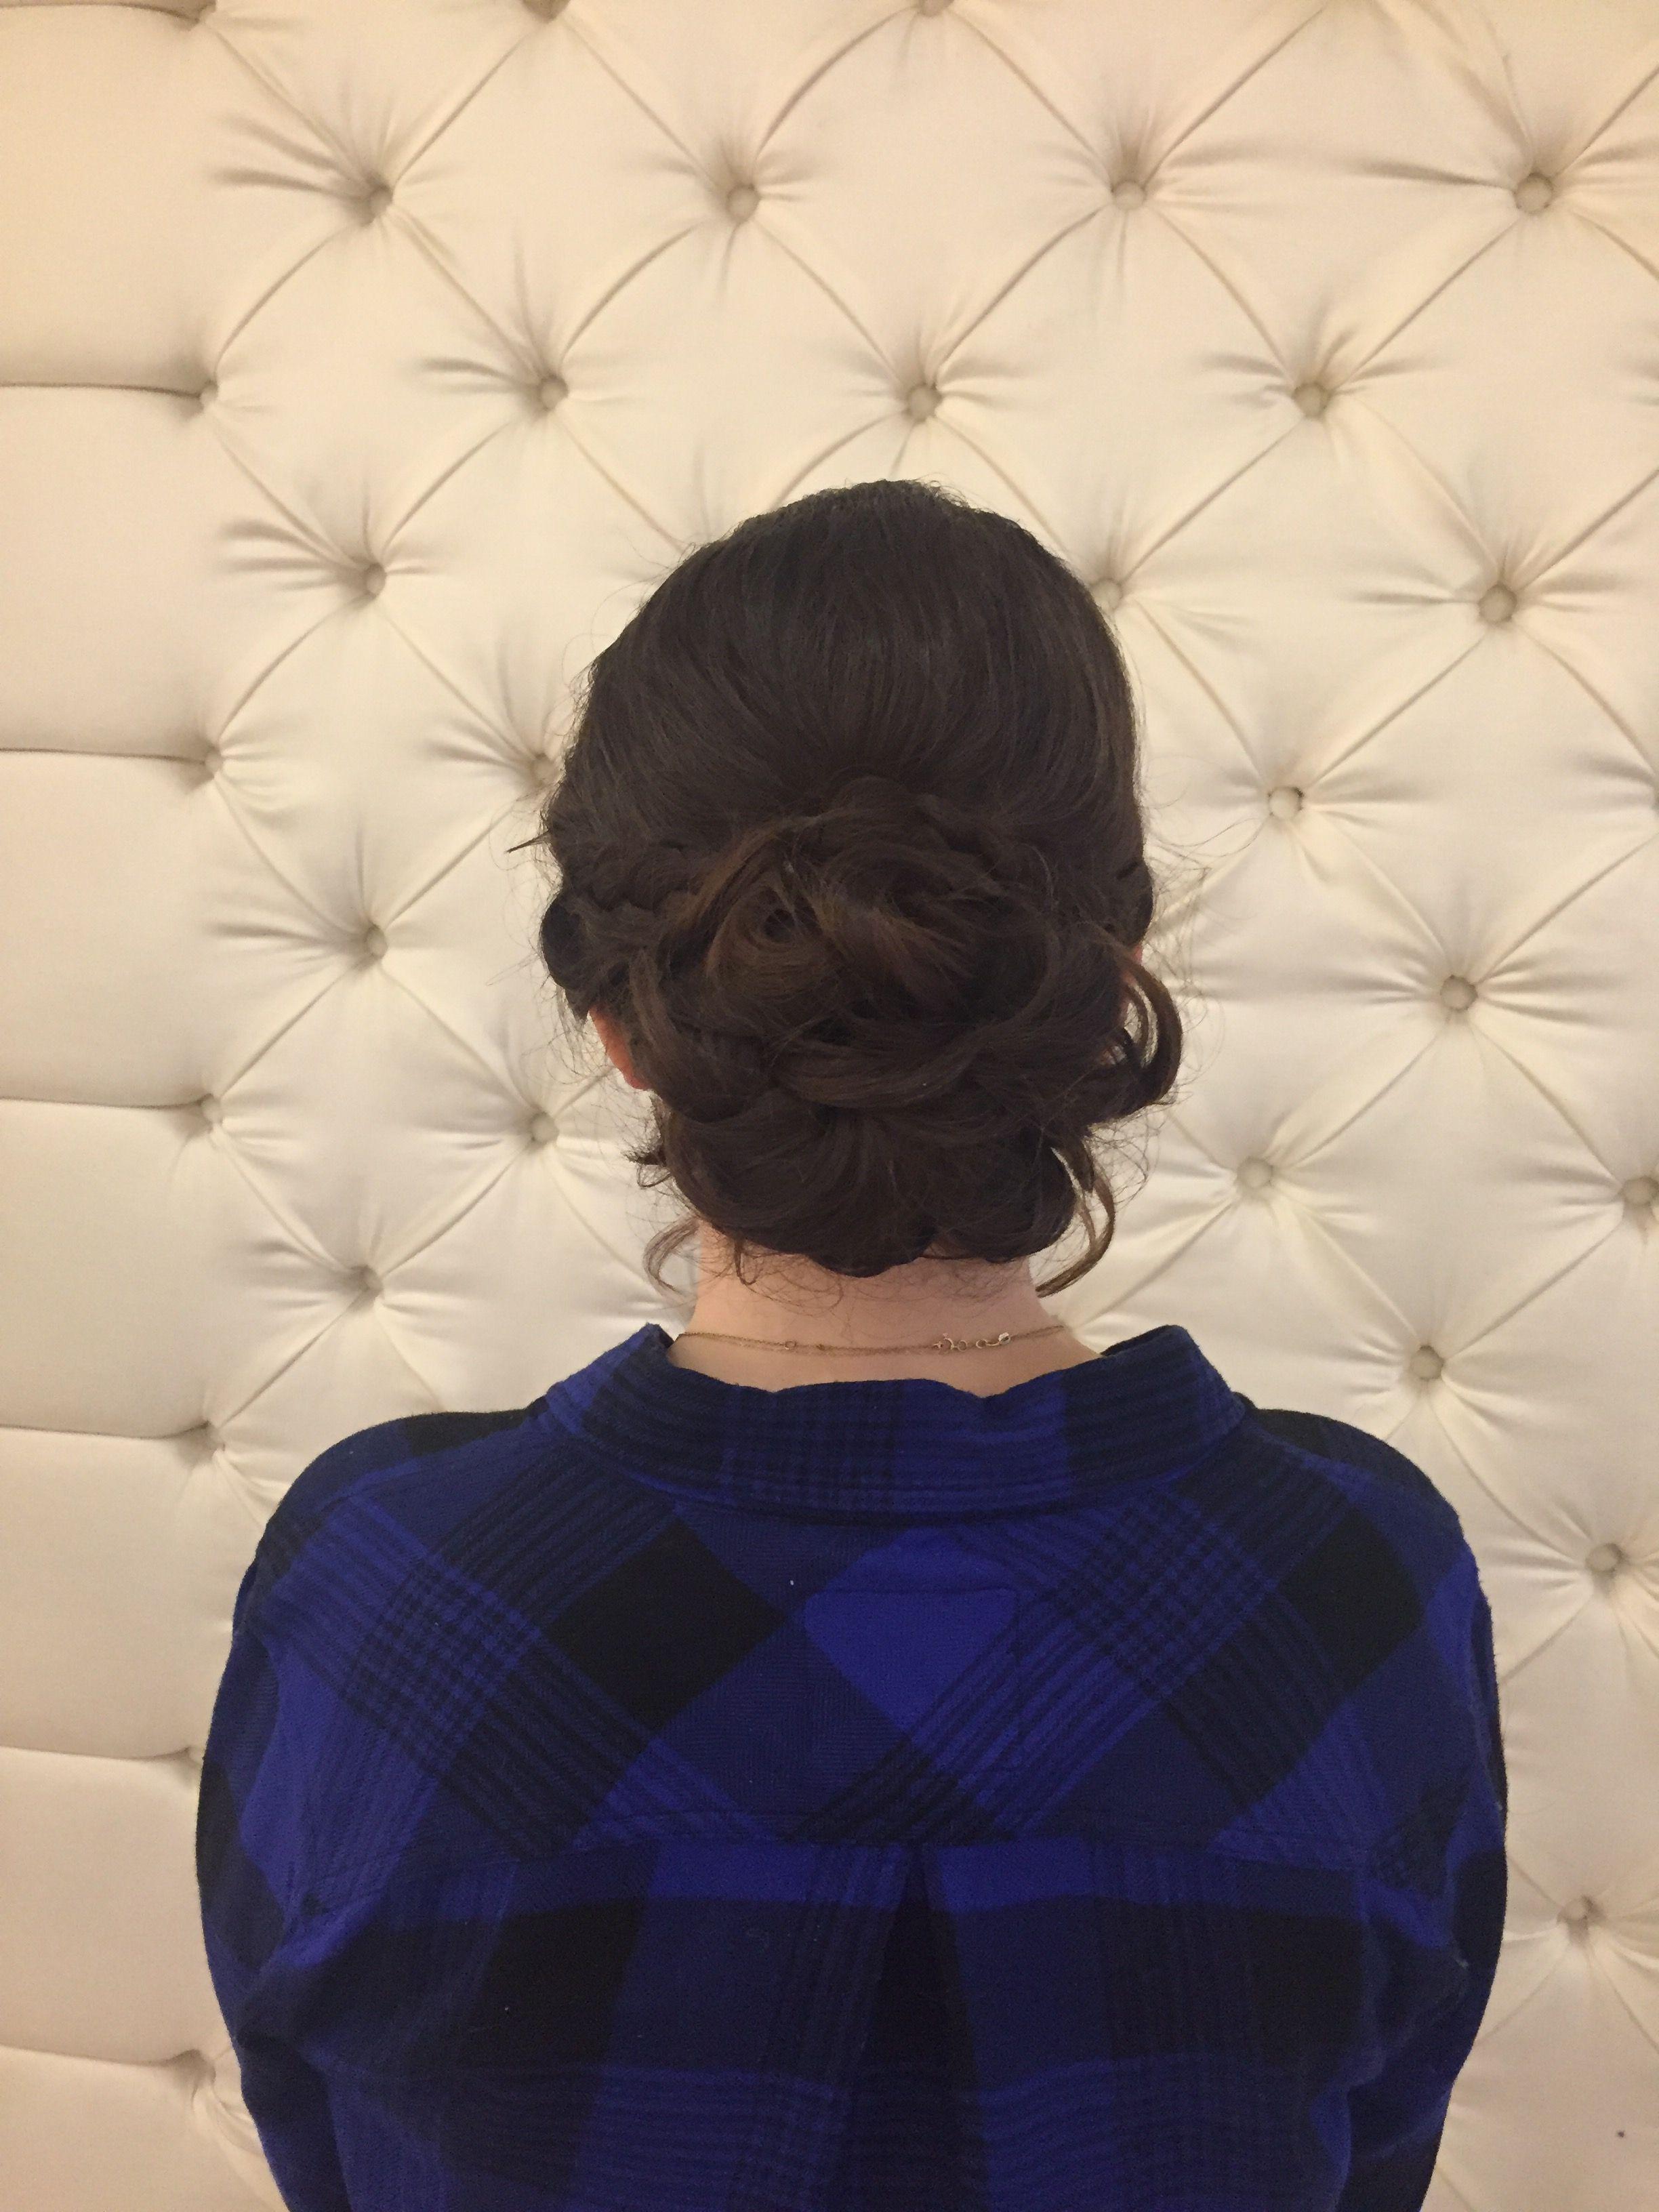 Pin By Jennifer Penman On Drybaruppereastside Jens Hair Style Bridal Style Hair Styles